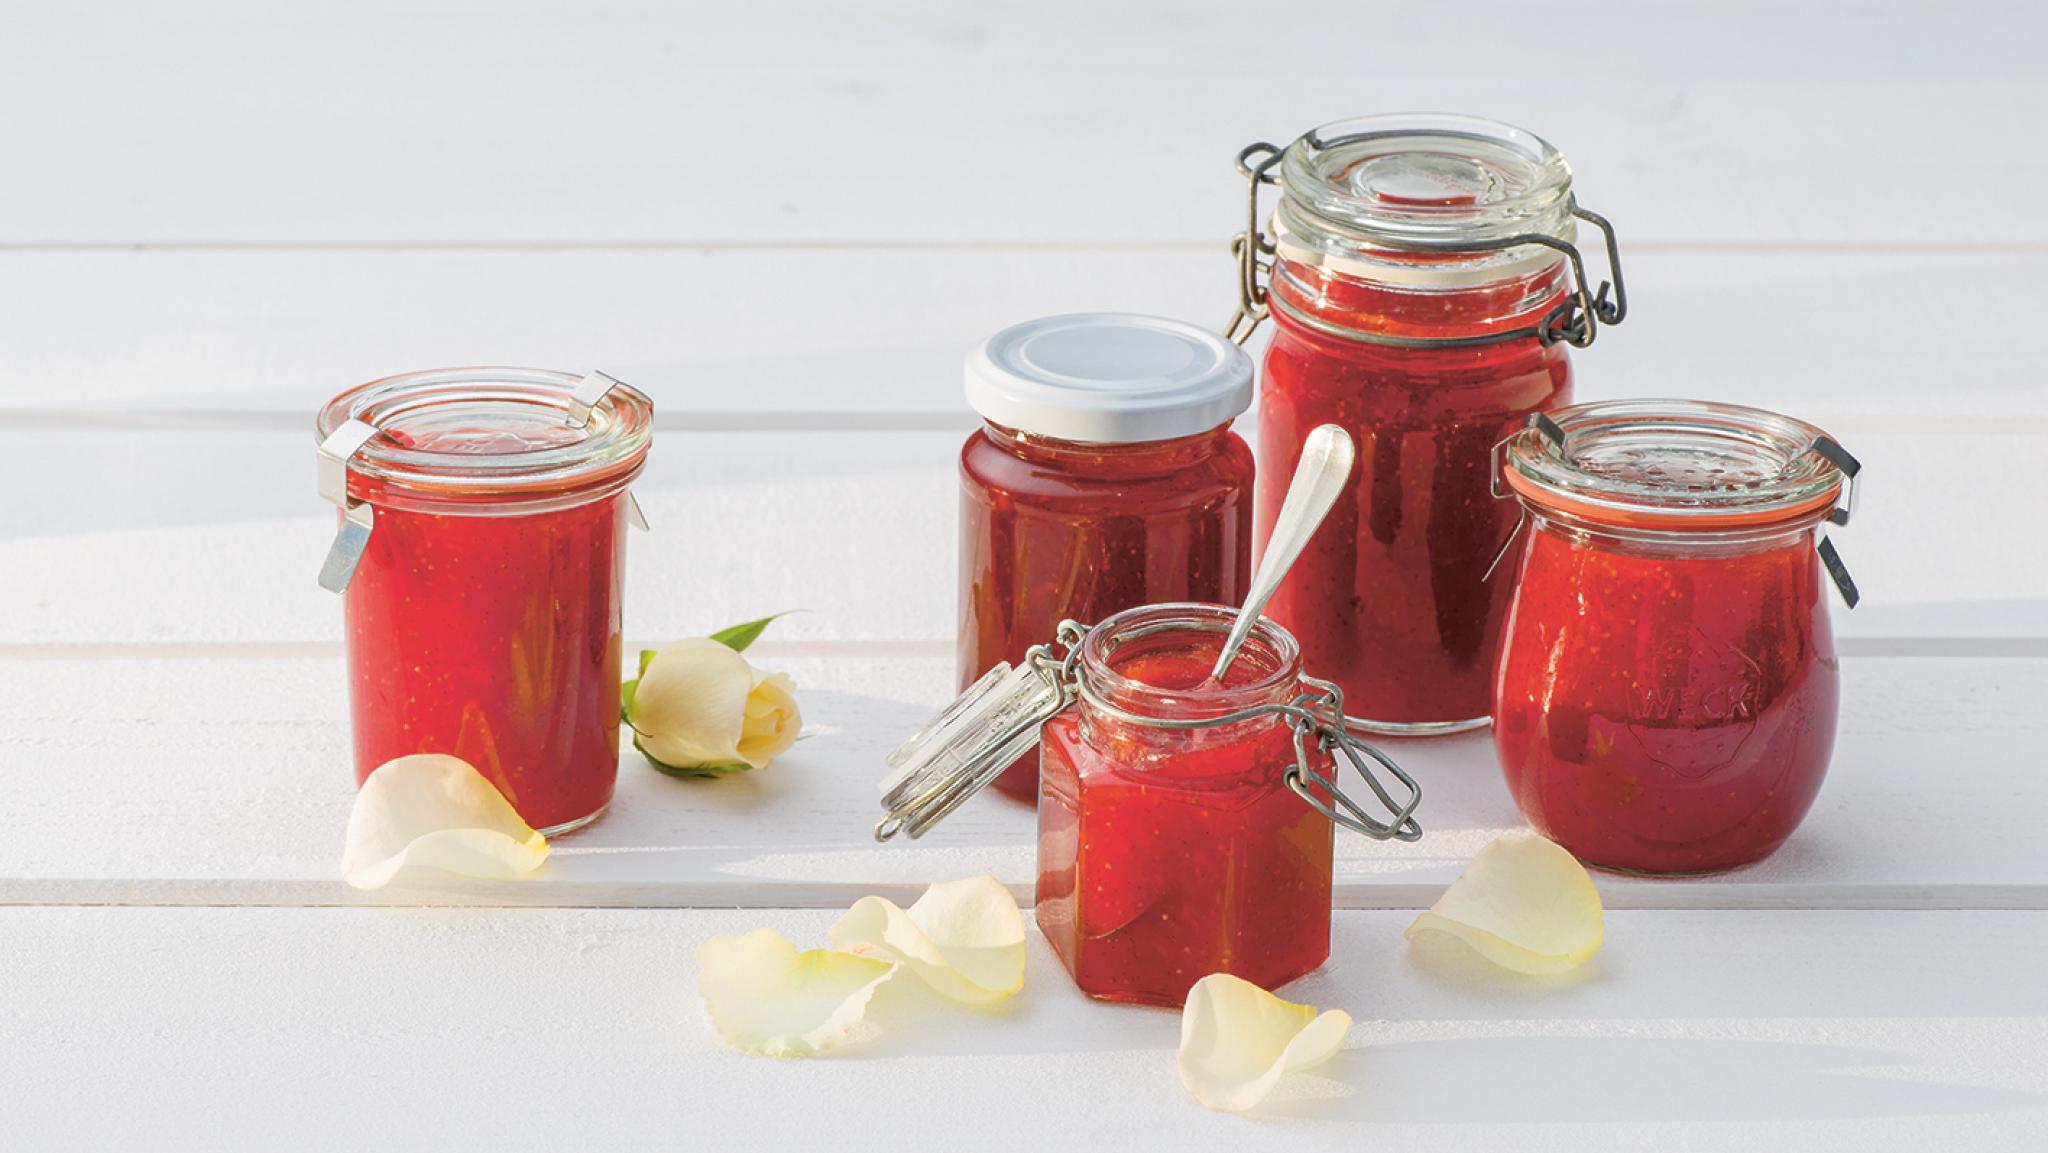 Erdbeer-Rosen-Konfitüre